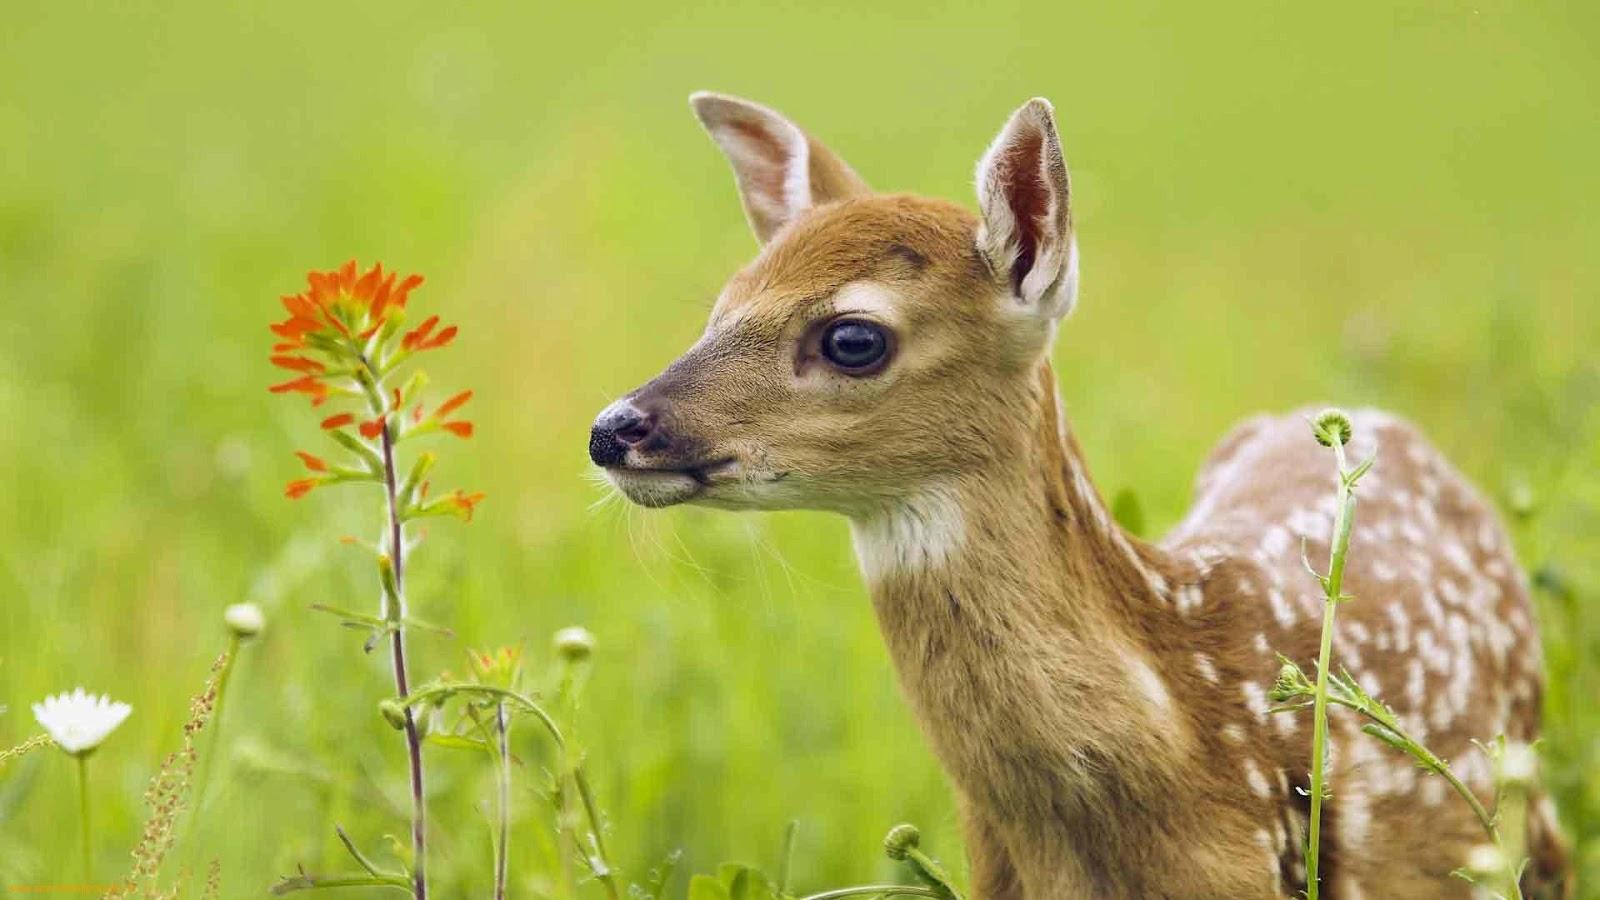 for deer hd deer wallpapers full hd wallpaper animal hd wallpaper deer 1600x900